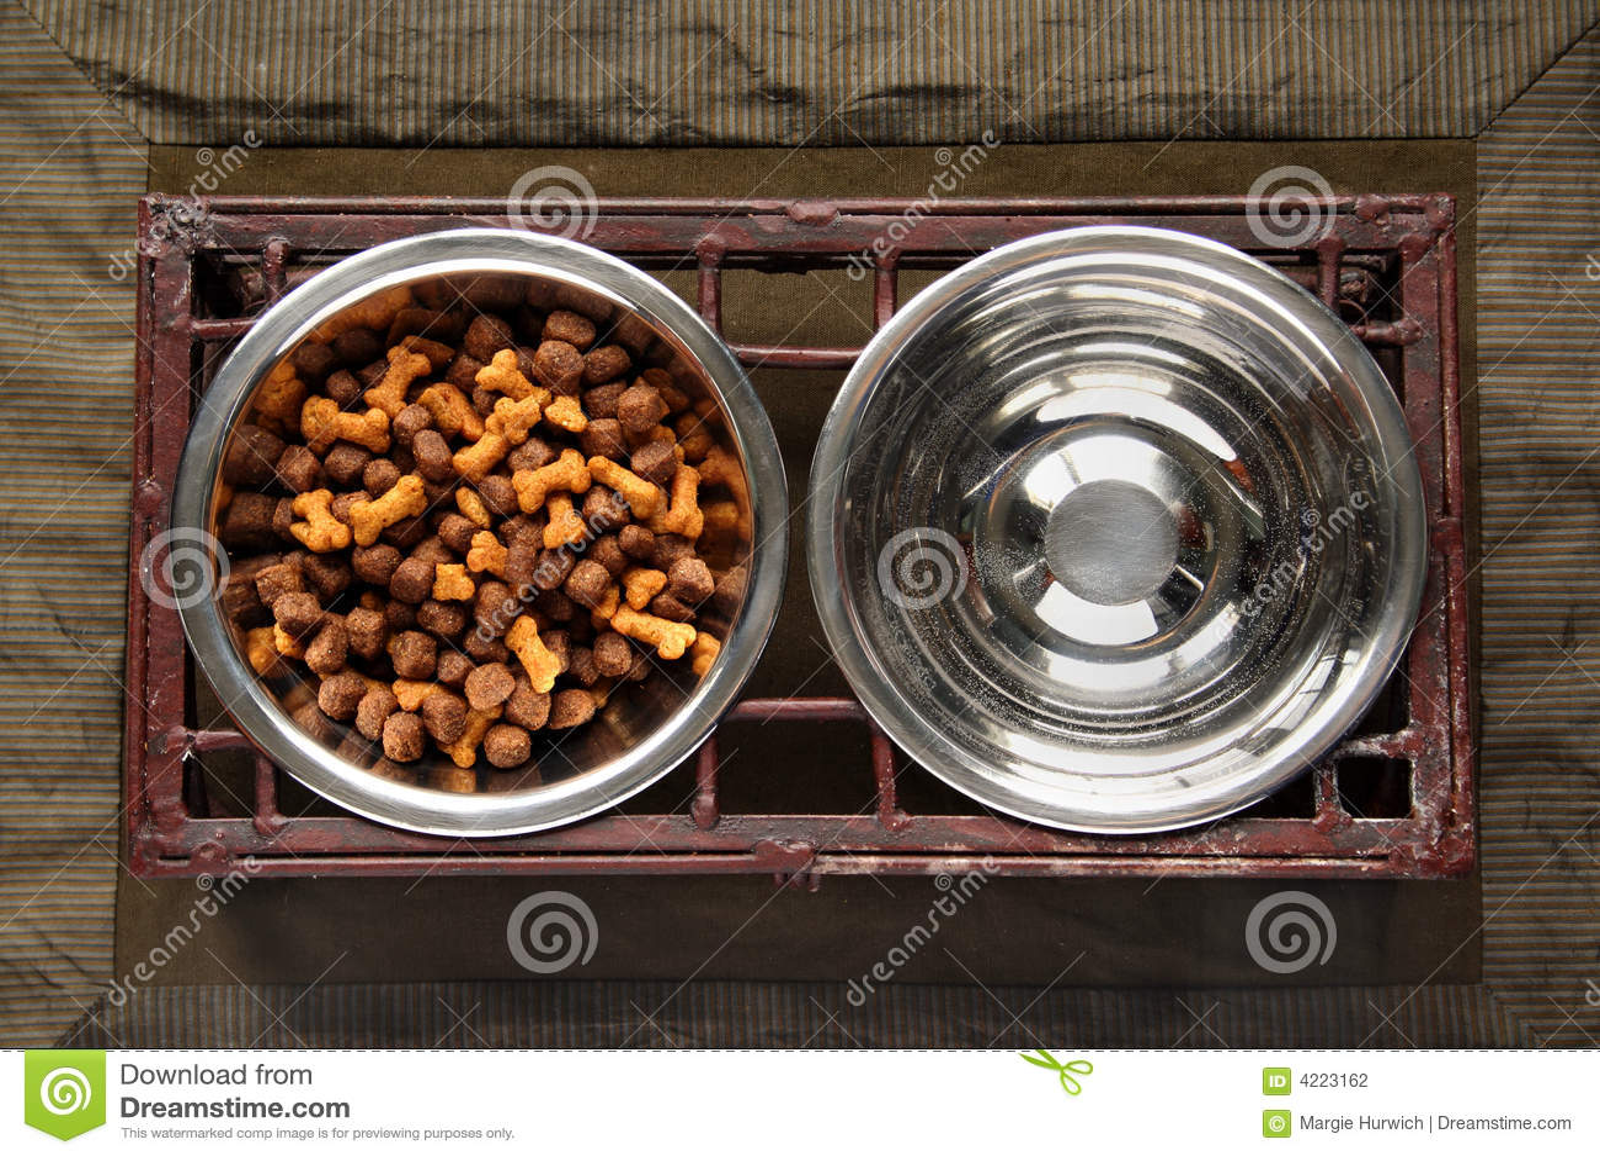 Iron Raw Dog Food